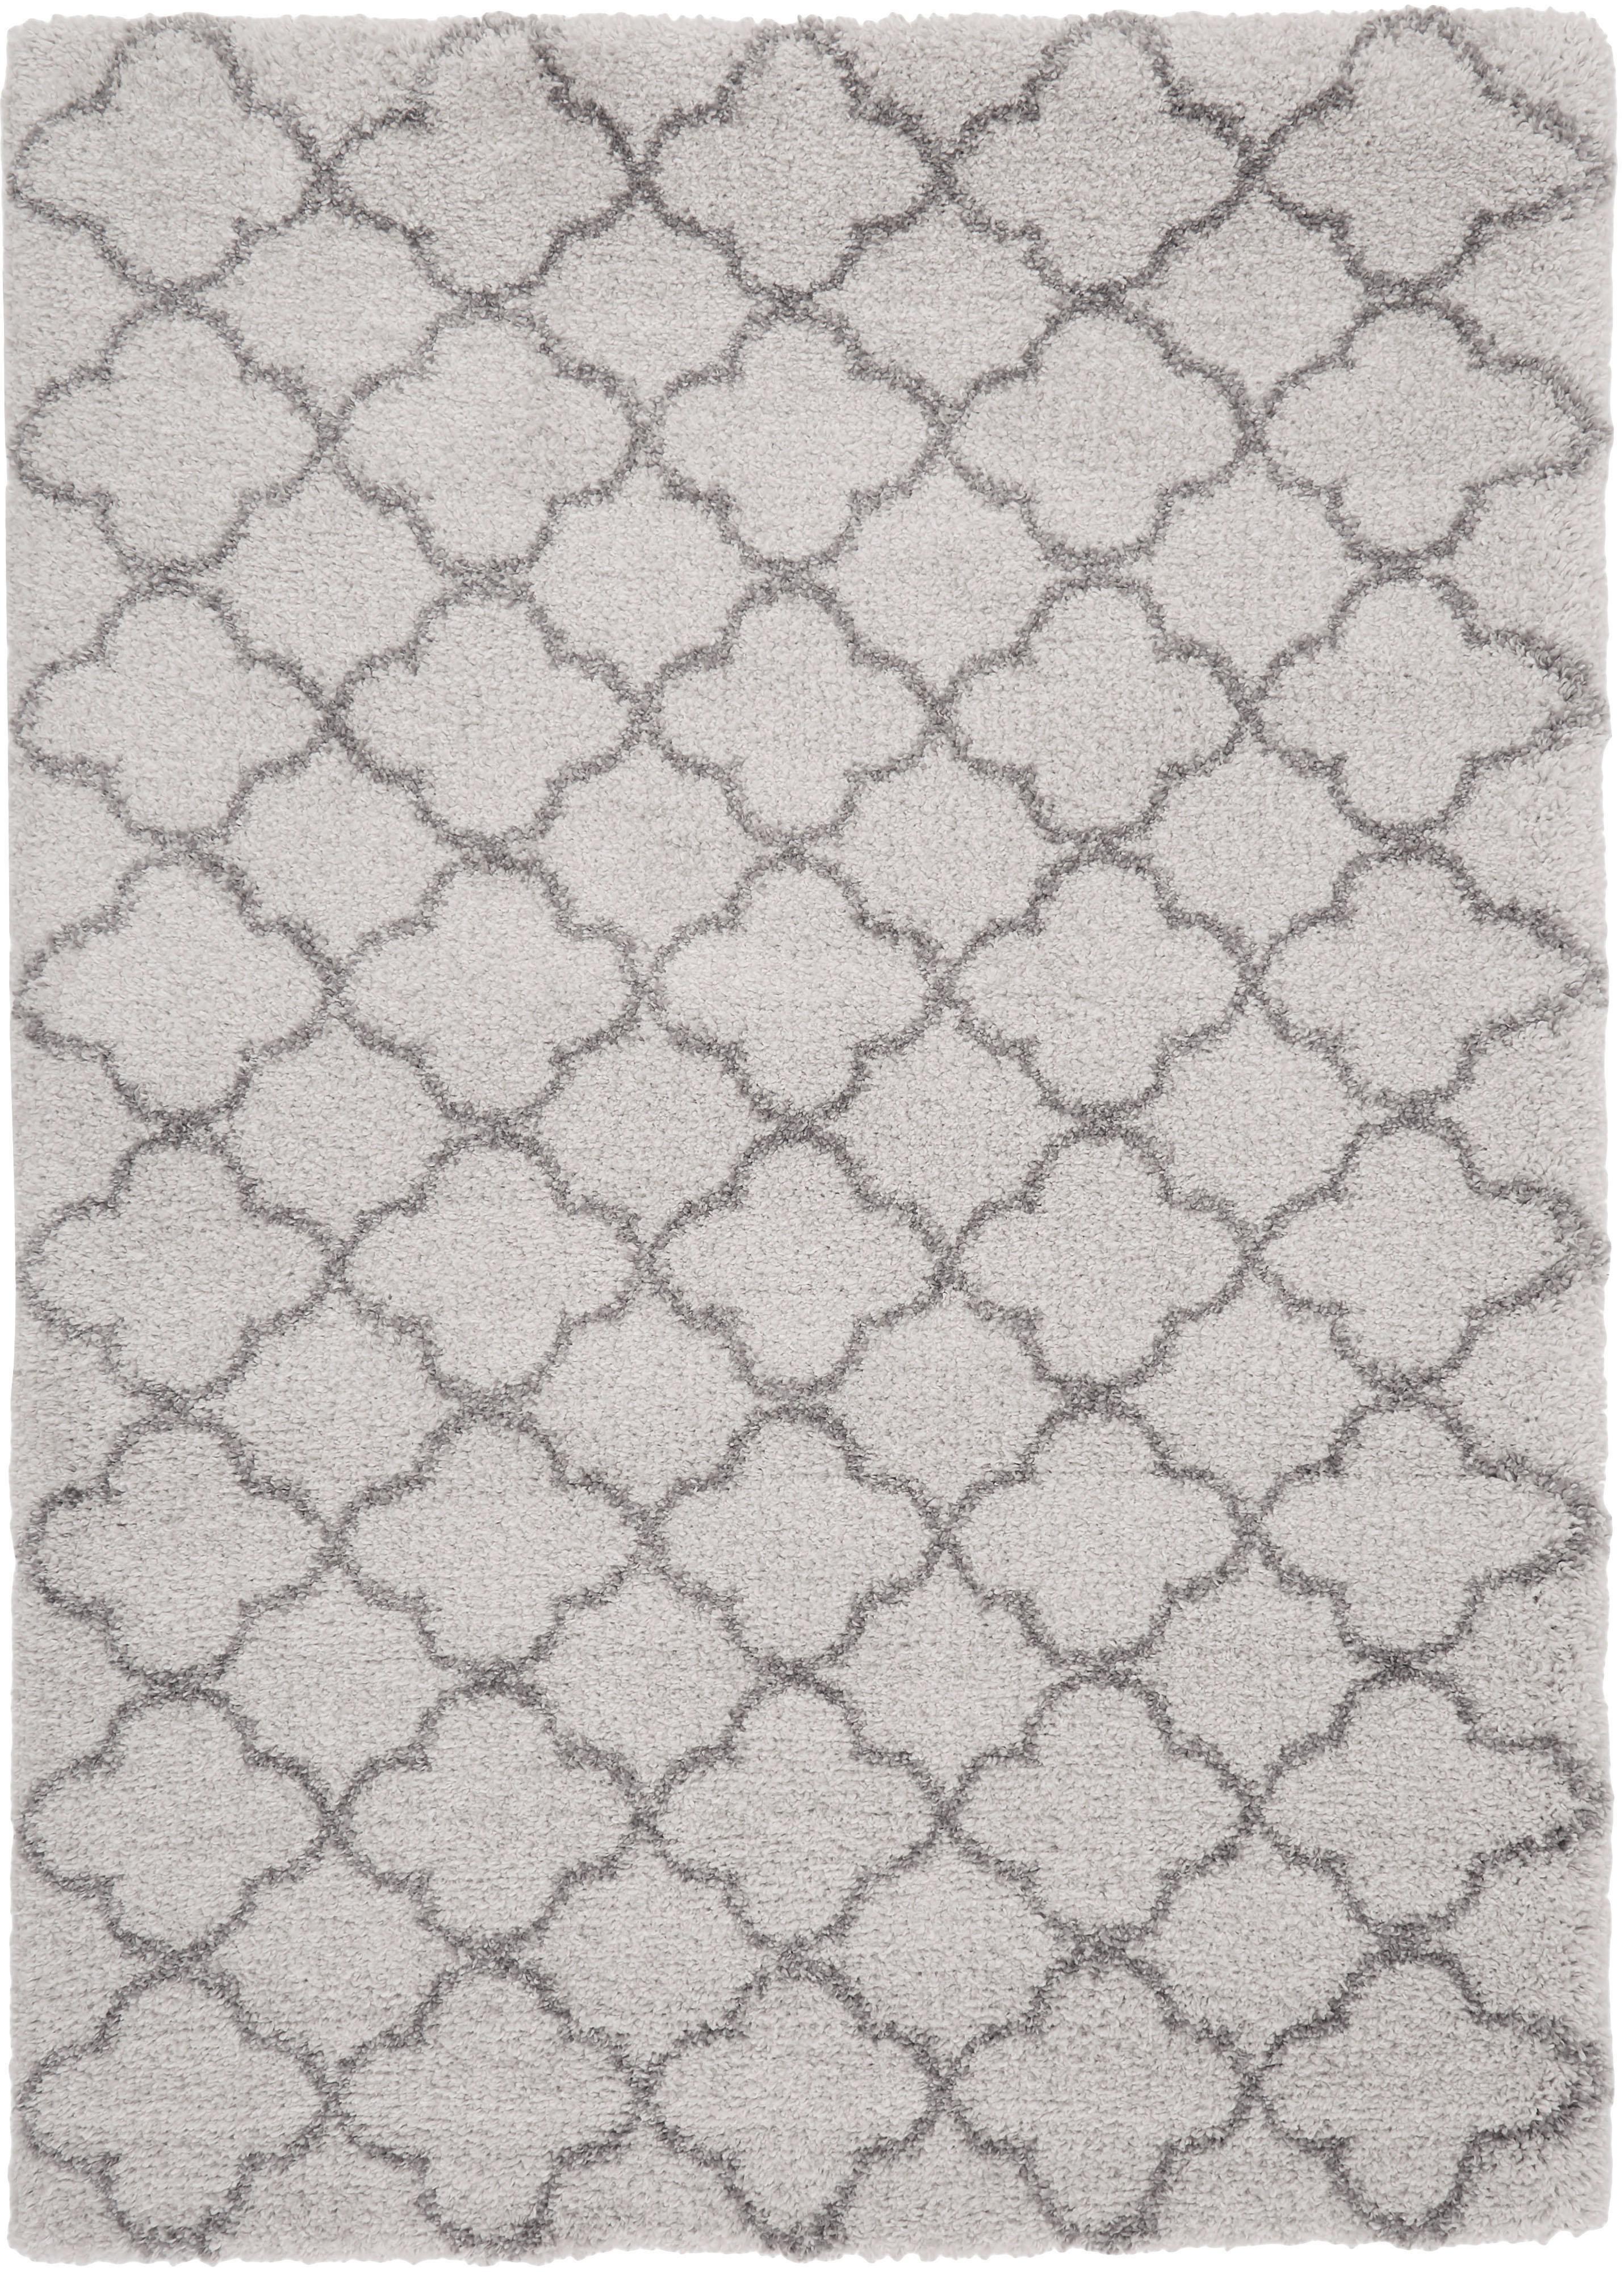 Hochflor-Teppich Luna in Creme/Grau, Flor: 100% Polypropylen, Creme, Grau, B 120 x L 170 cm (Größe S)